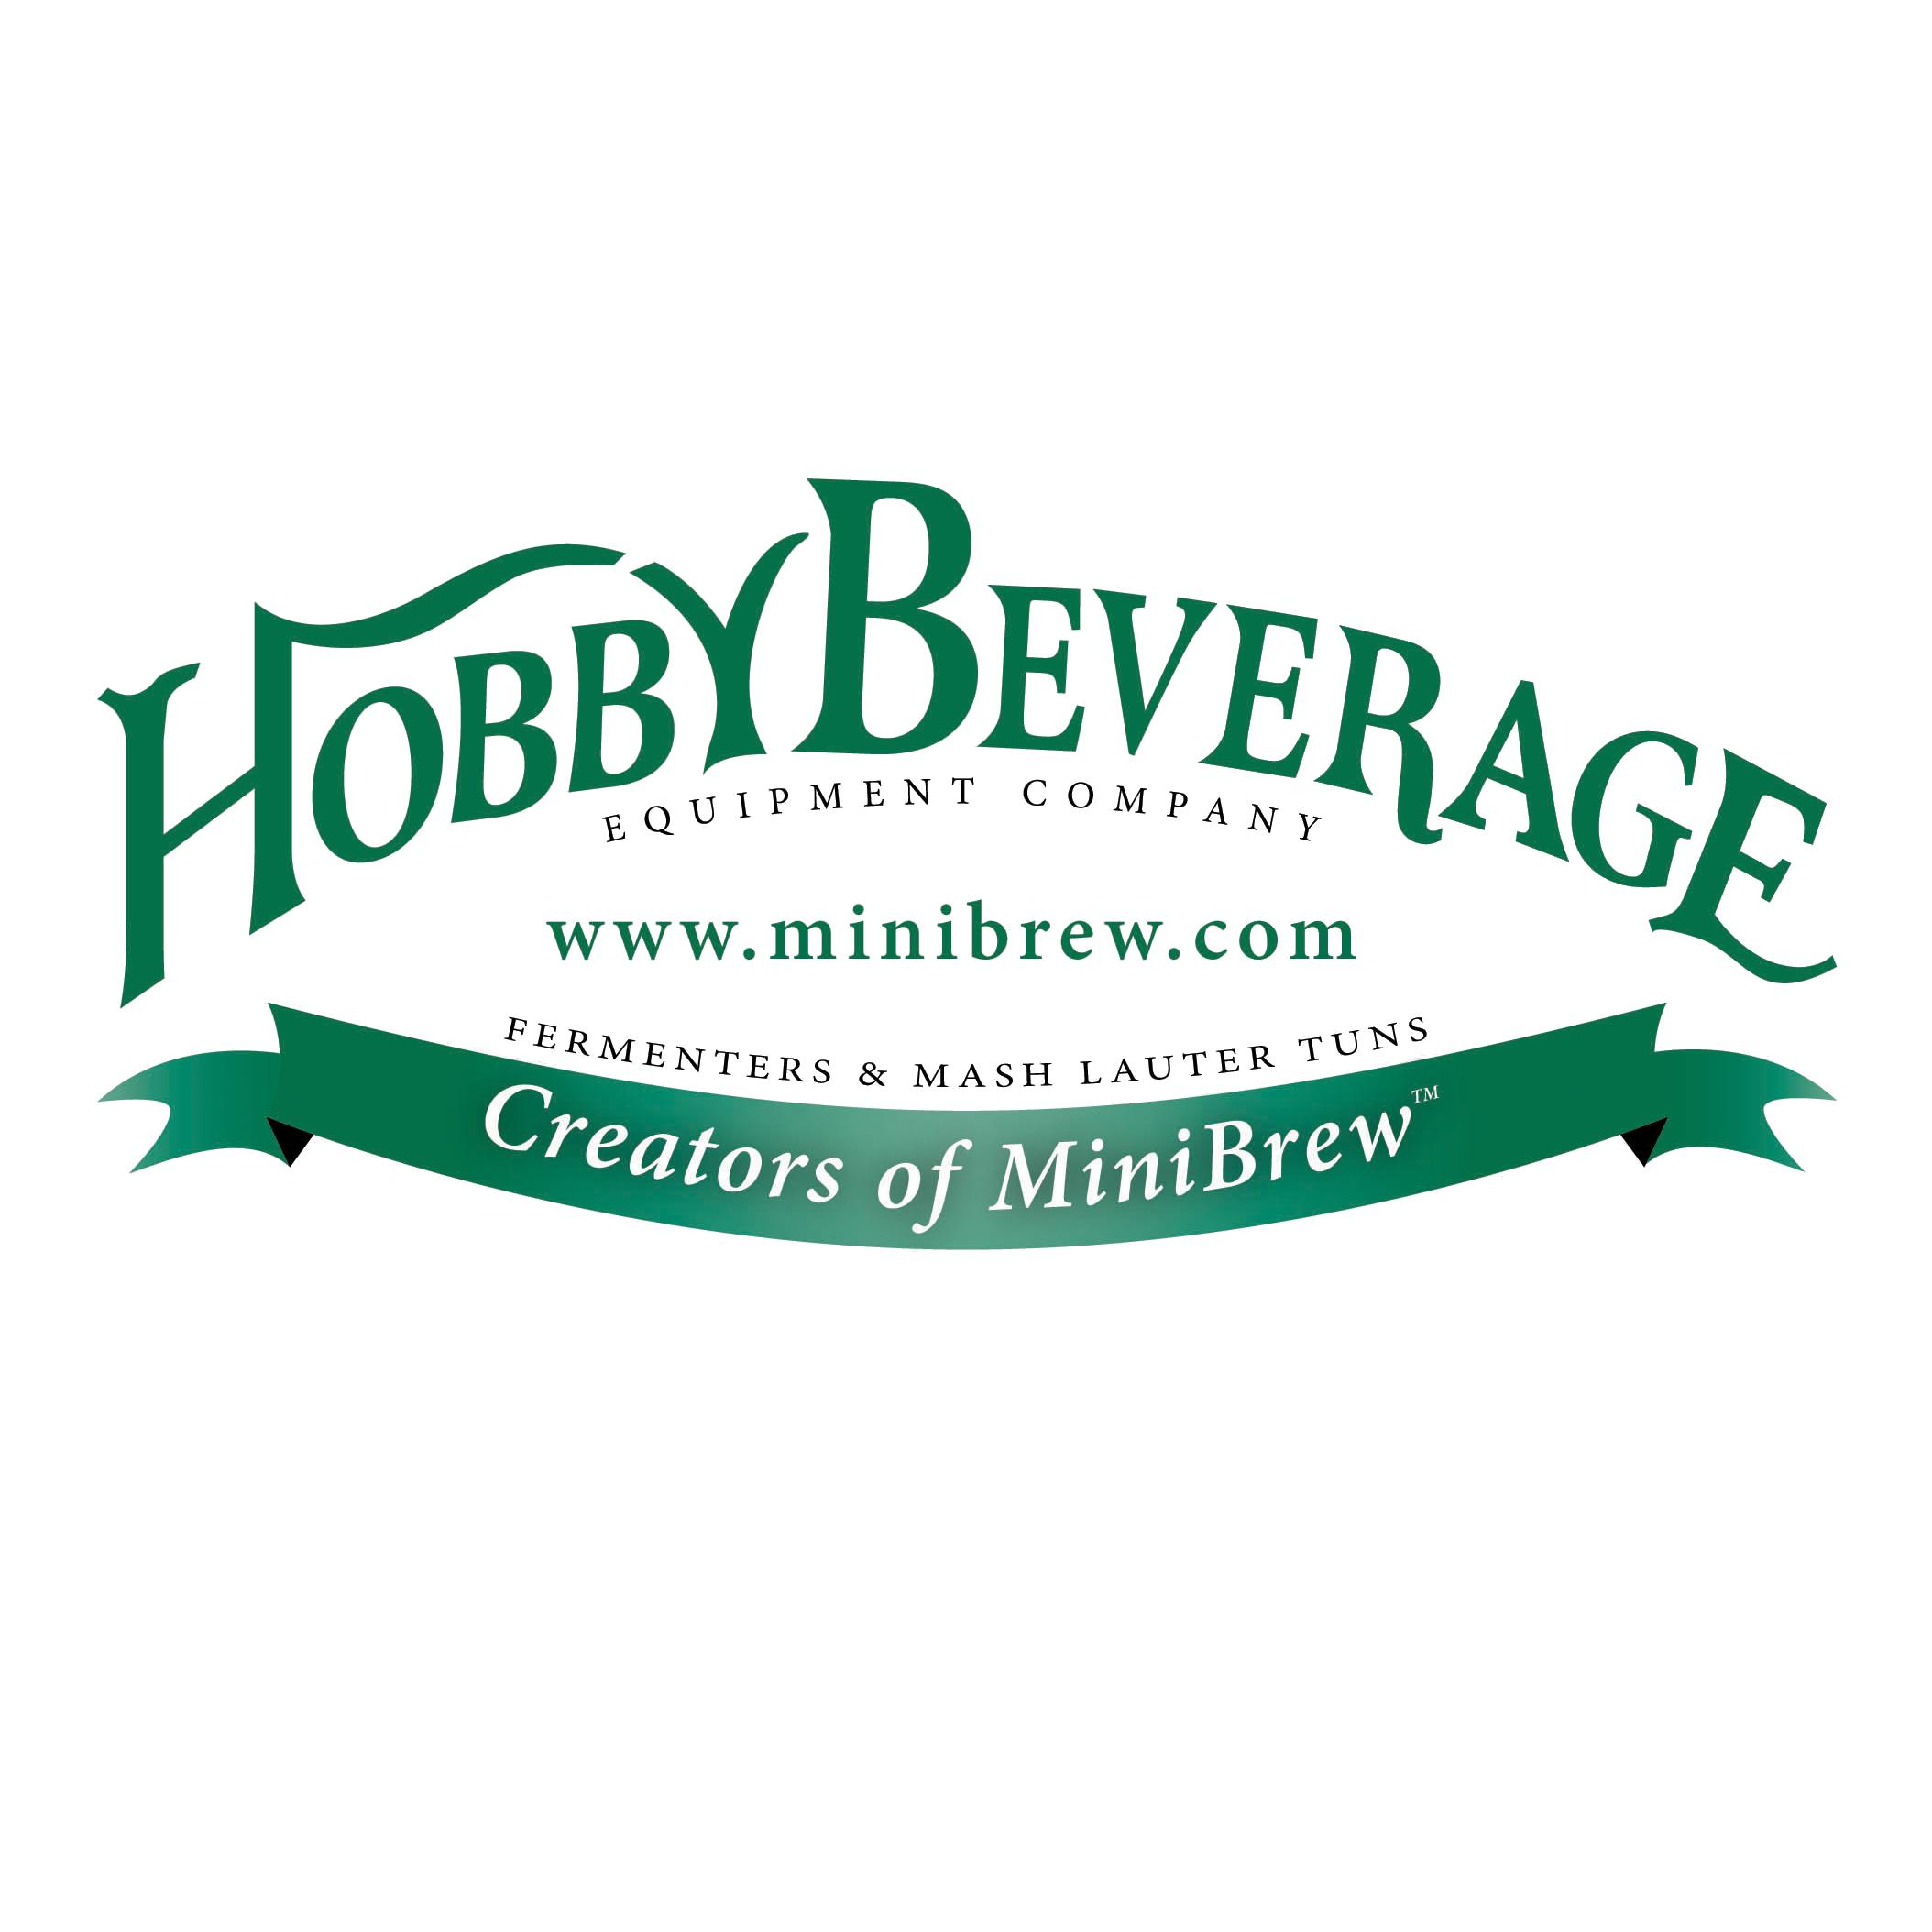 Hobby Beverage Logo